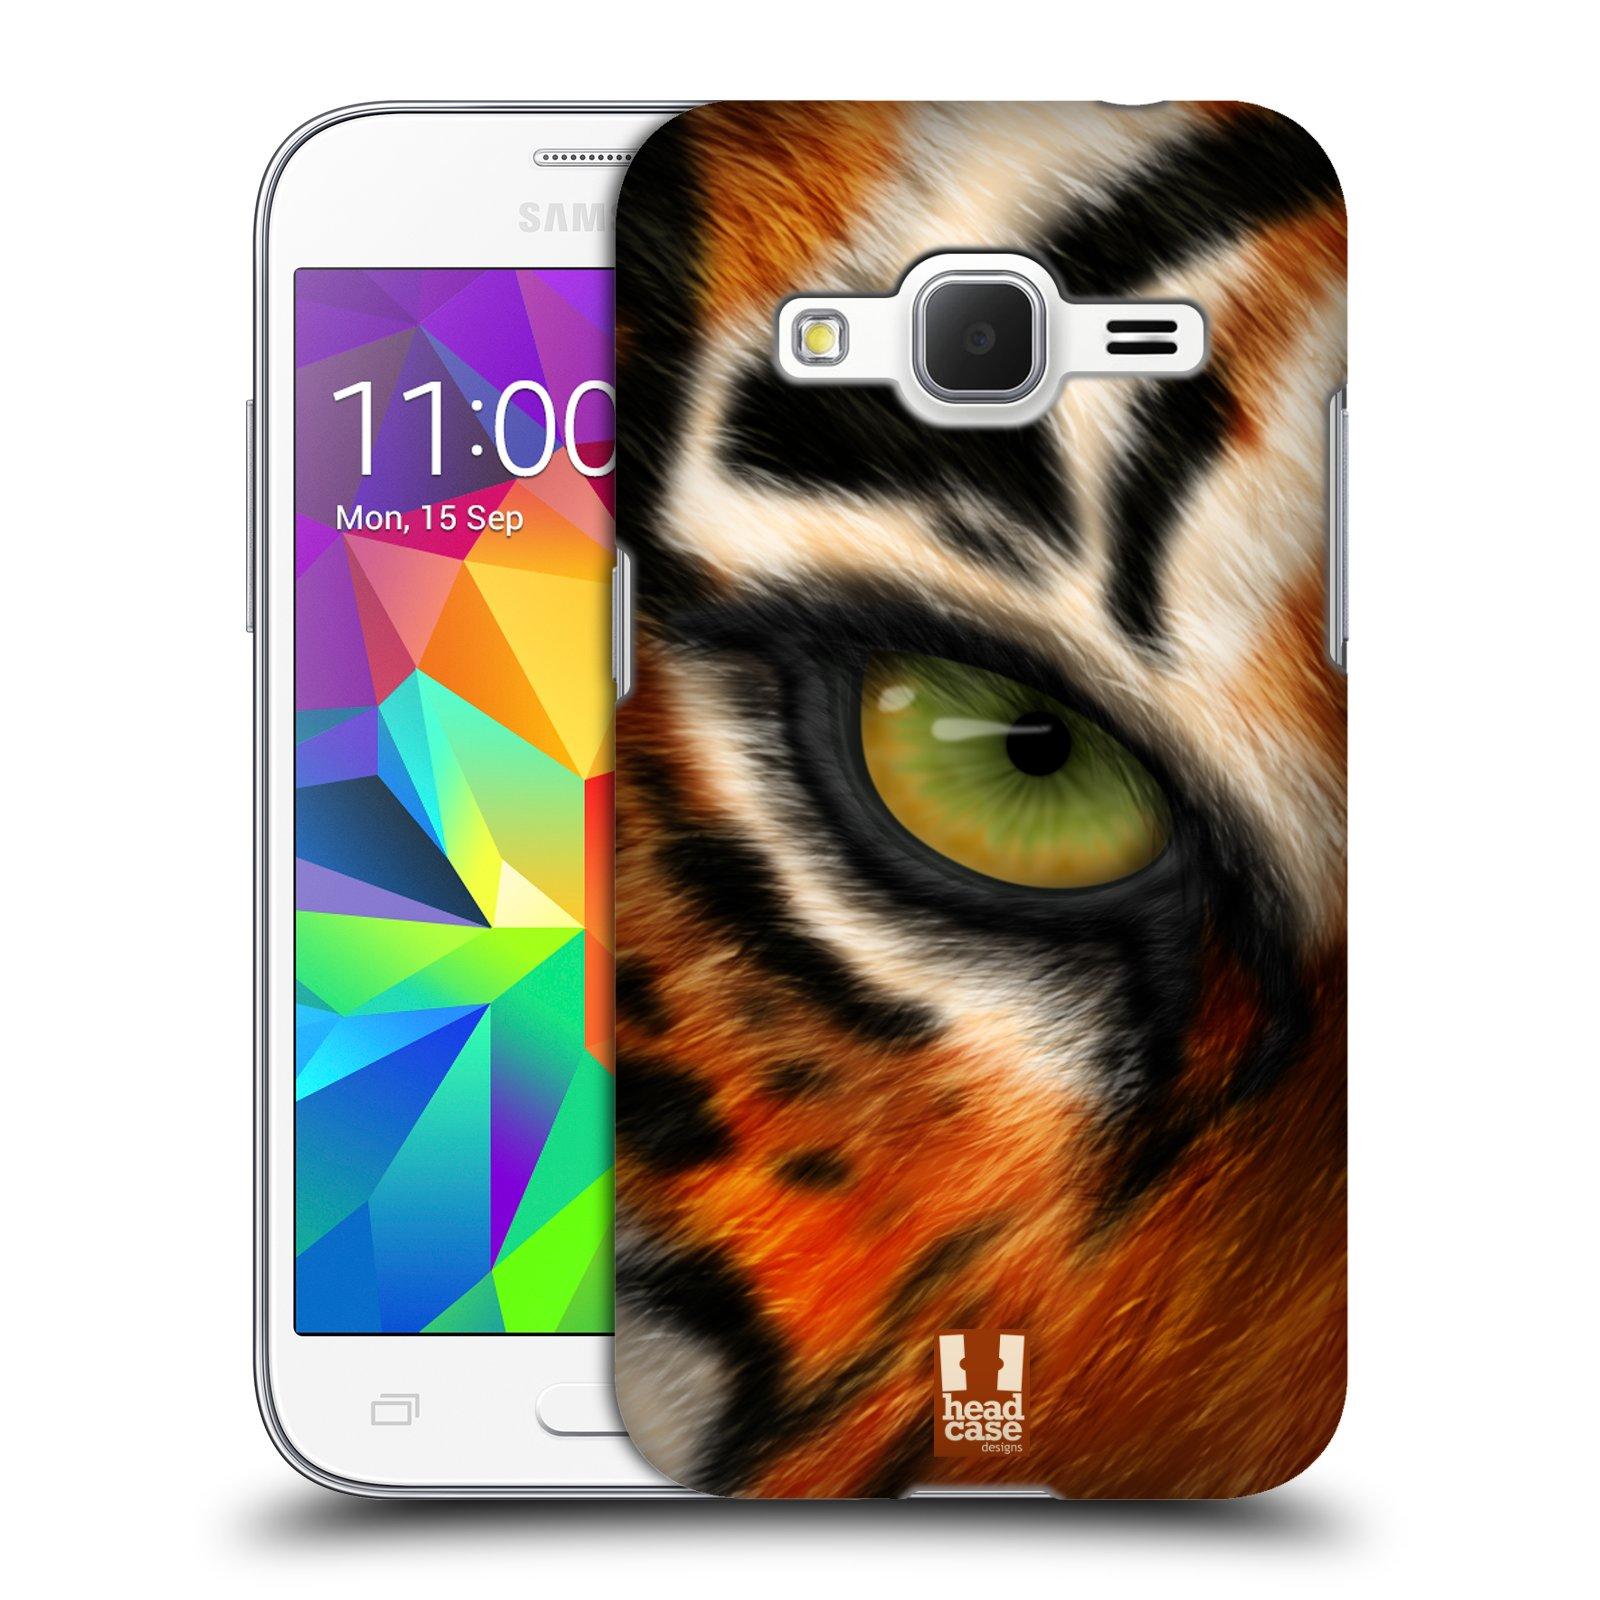 HEAD CASE plastový obal na mobil SAMSUNG GALAXY Core Prime (Core Prime VE) vzor pohled zvířete oko tygr